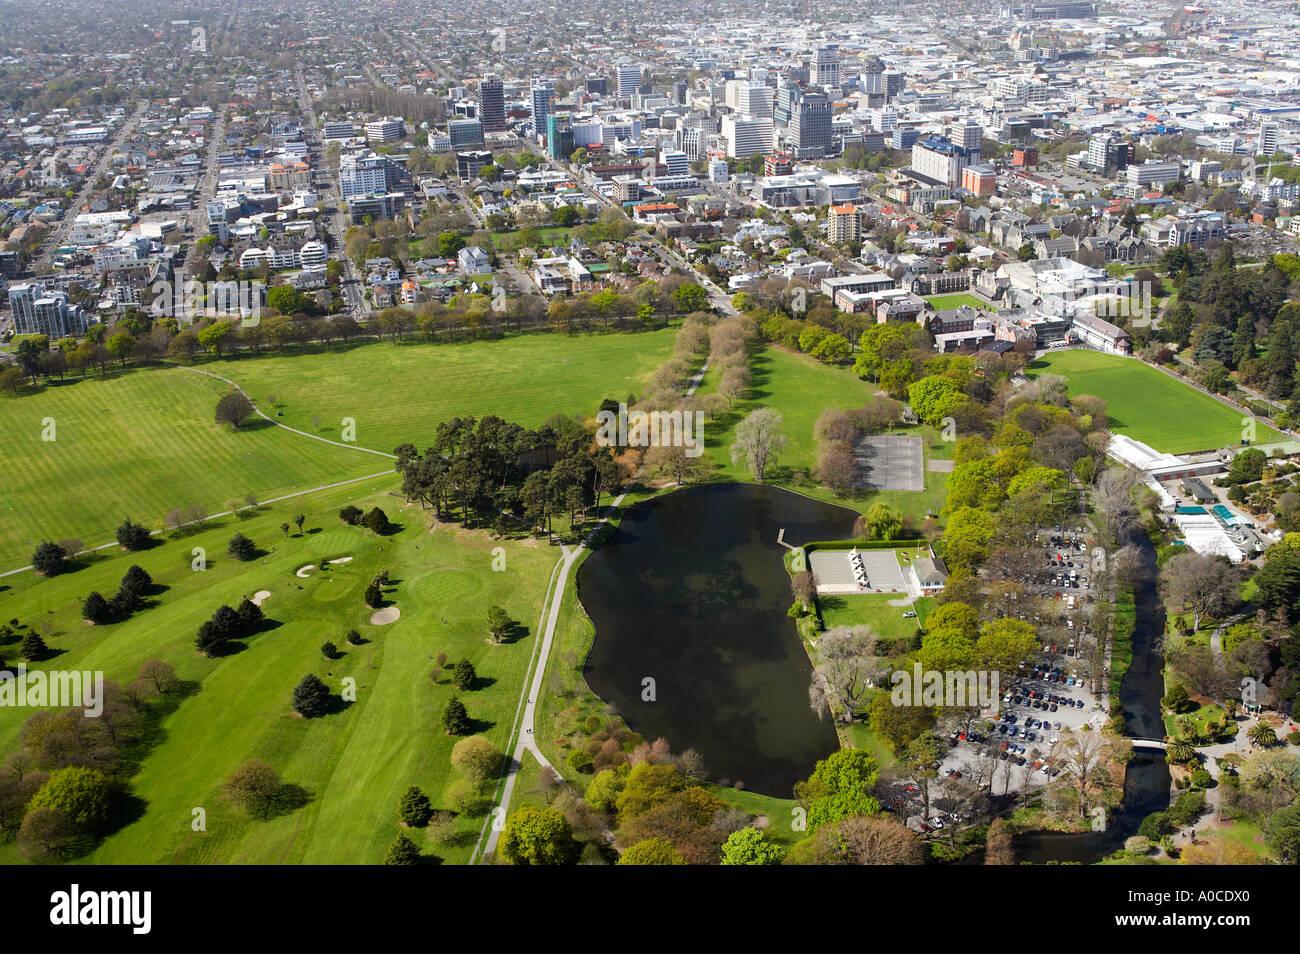 Hagley Park and CBD Christchurch South Island New Zealand aerial - Stock Image